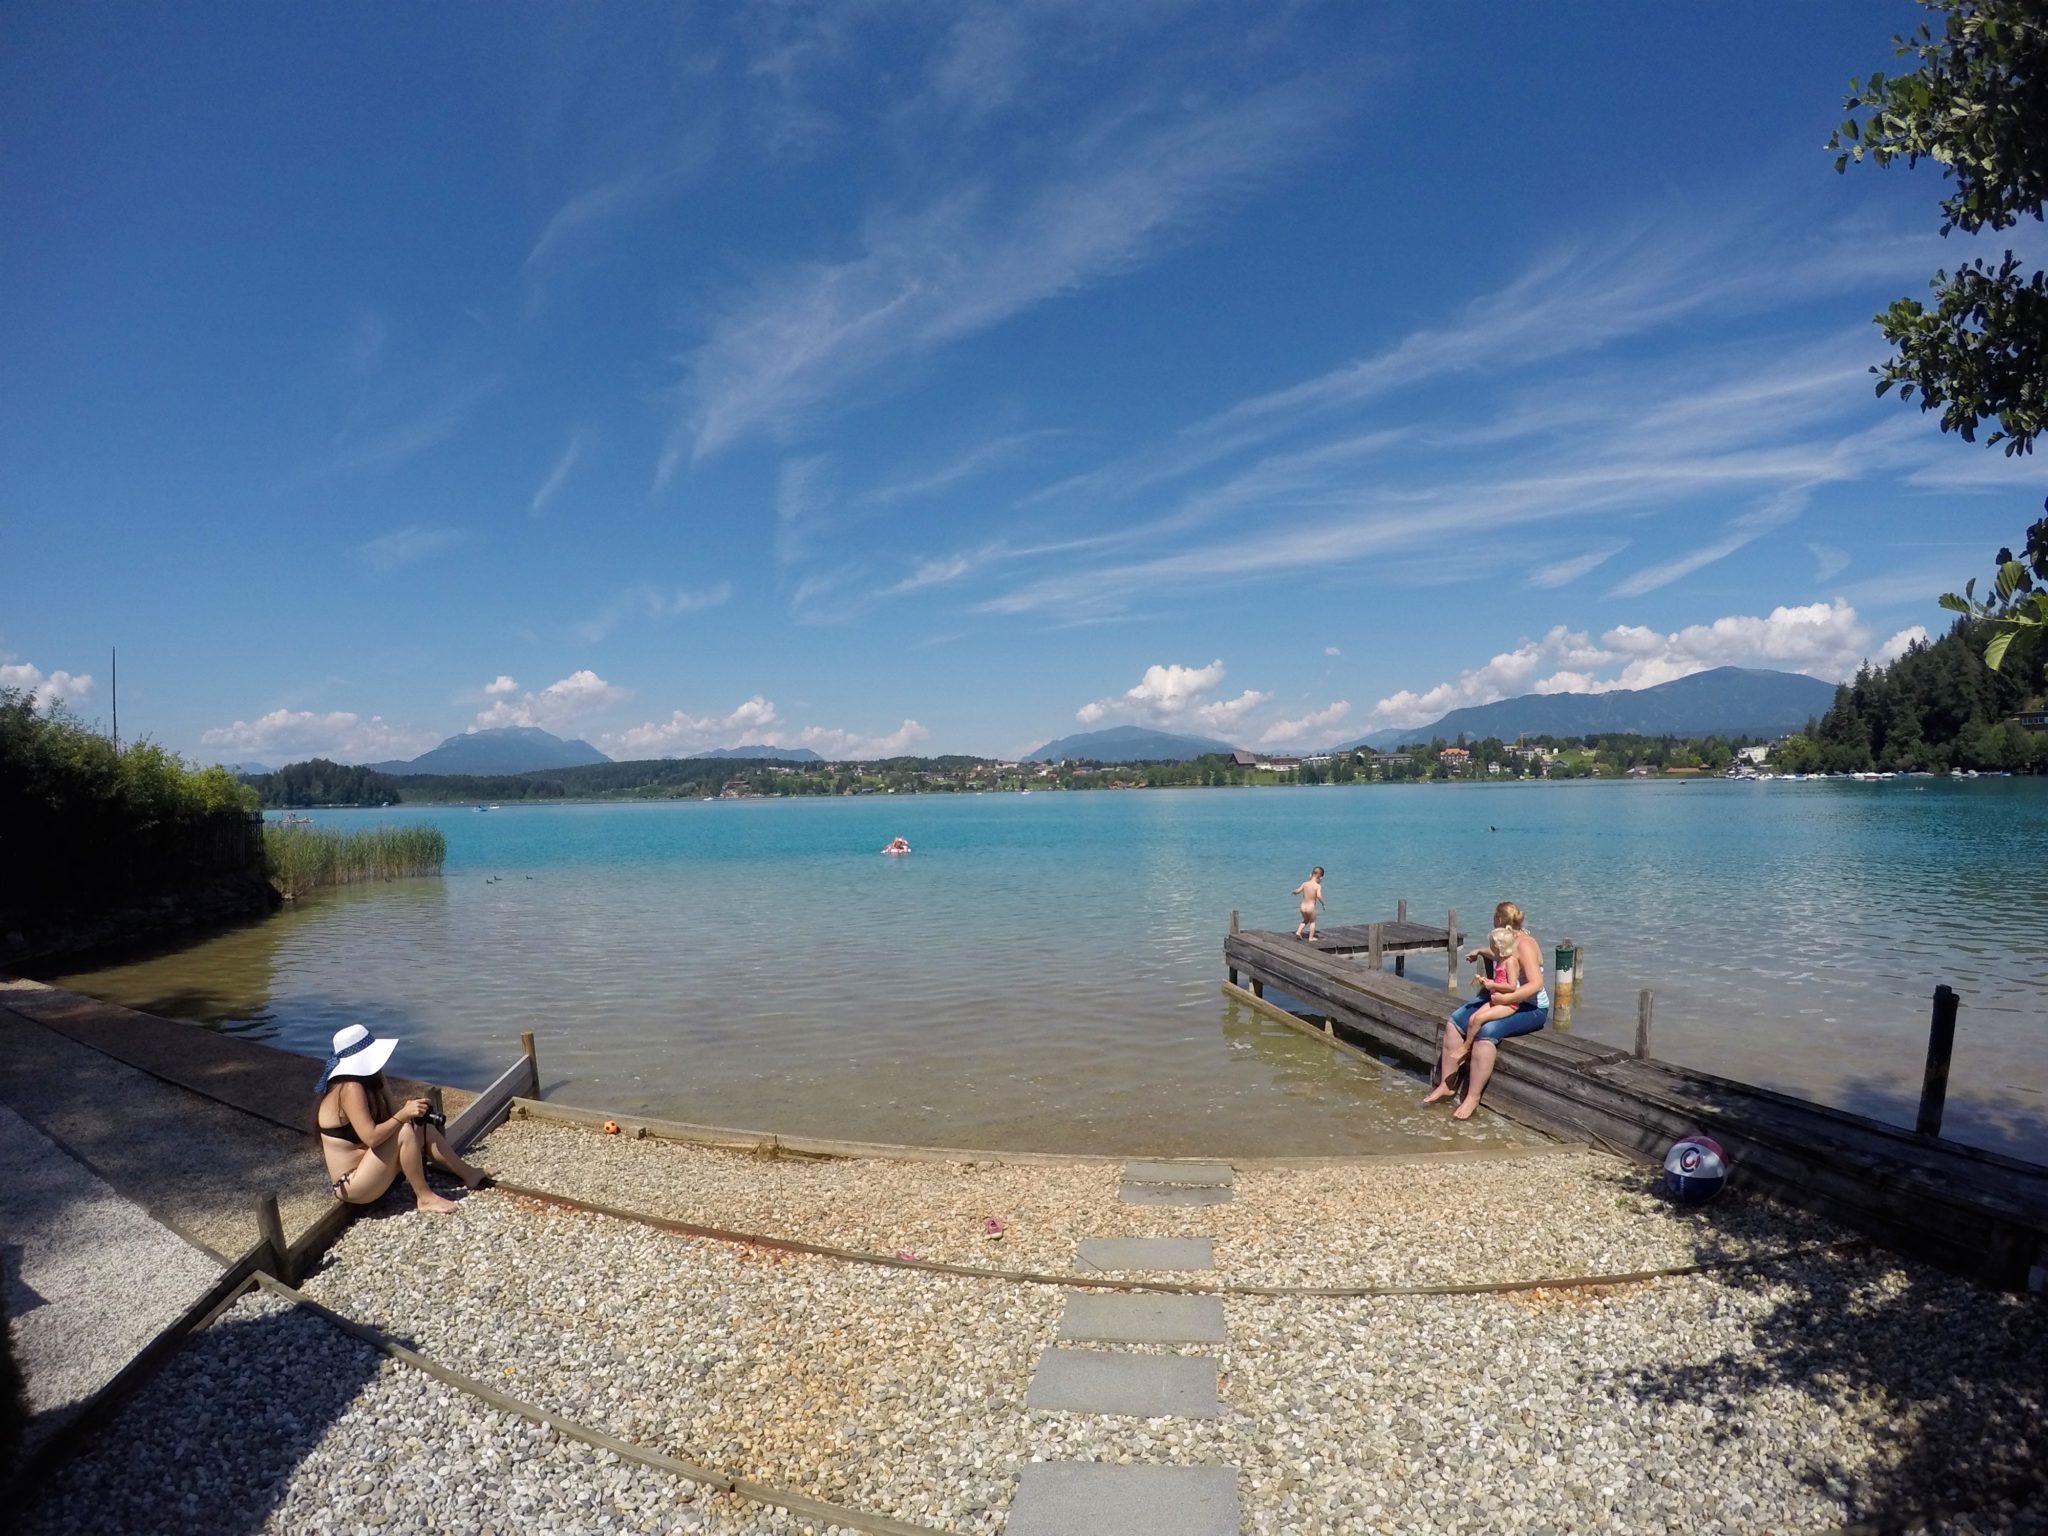 Lake Faak, Austria